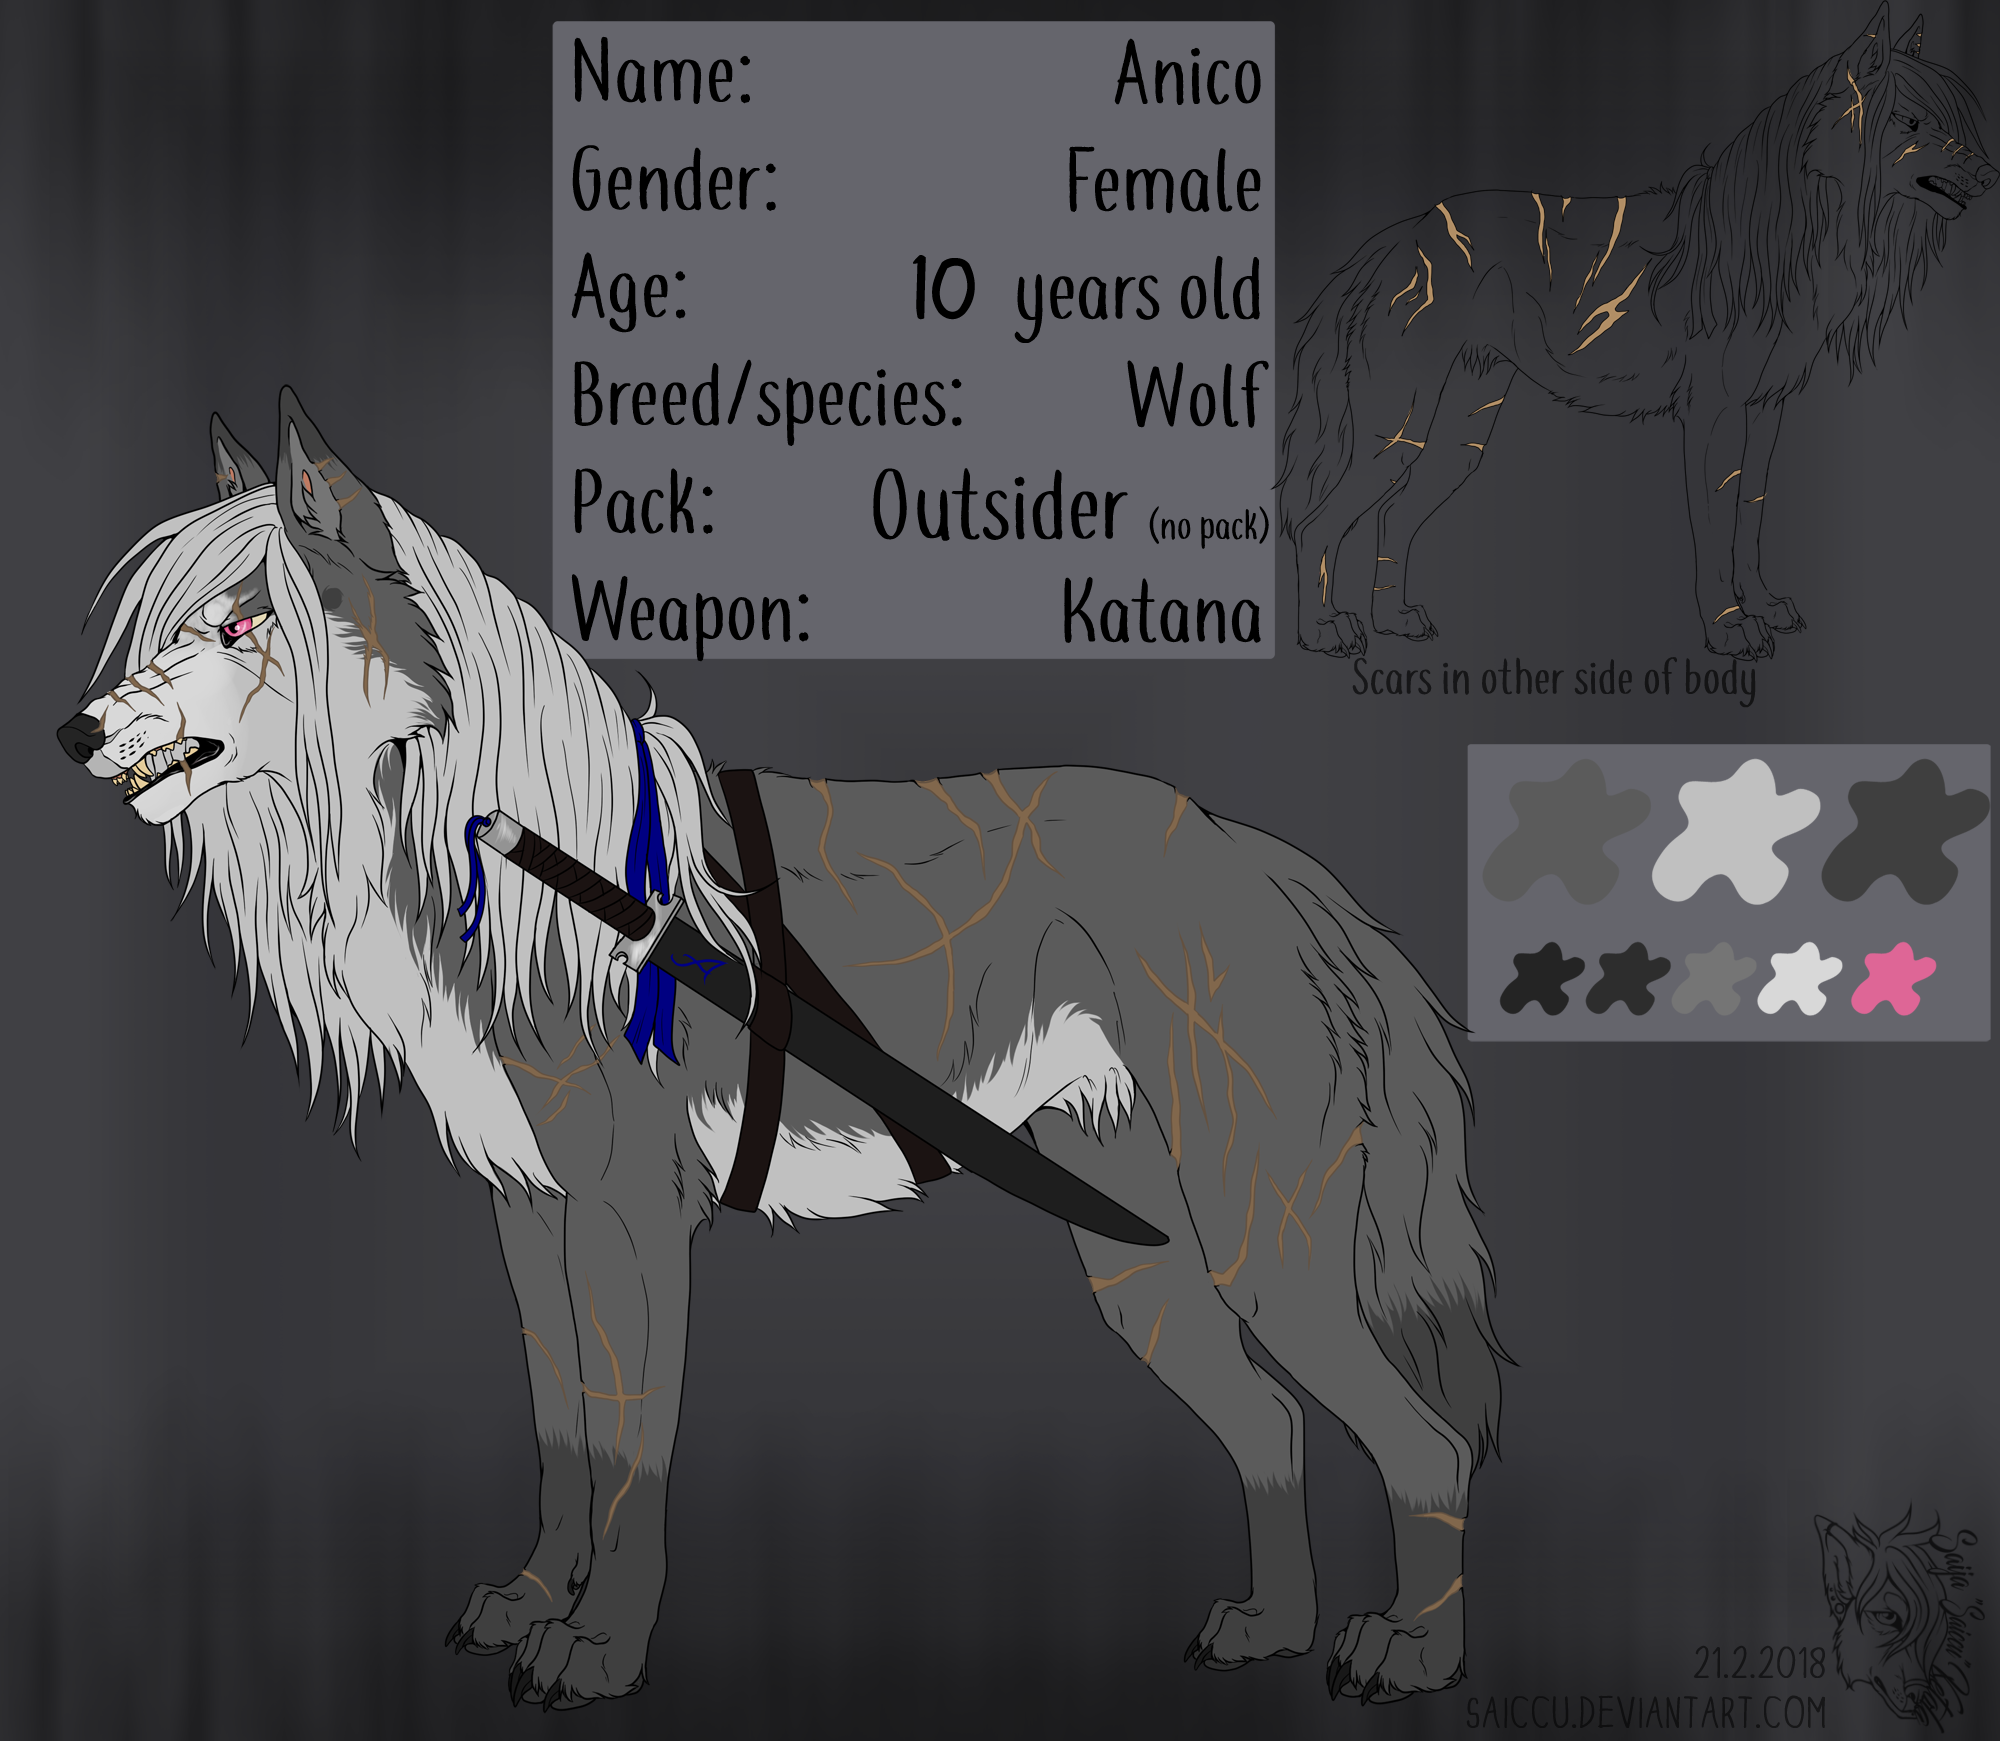 Anico .:Reference sheet:. by Saiccu